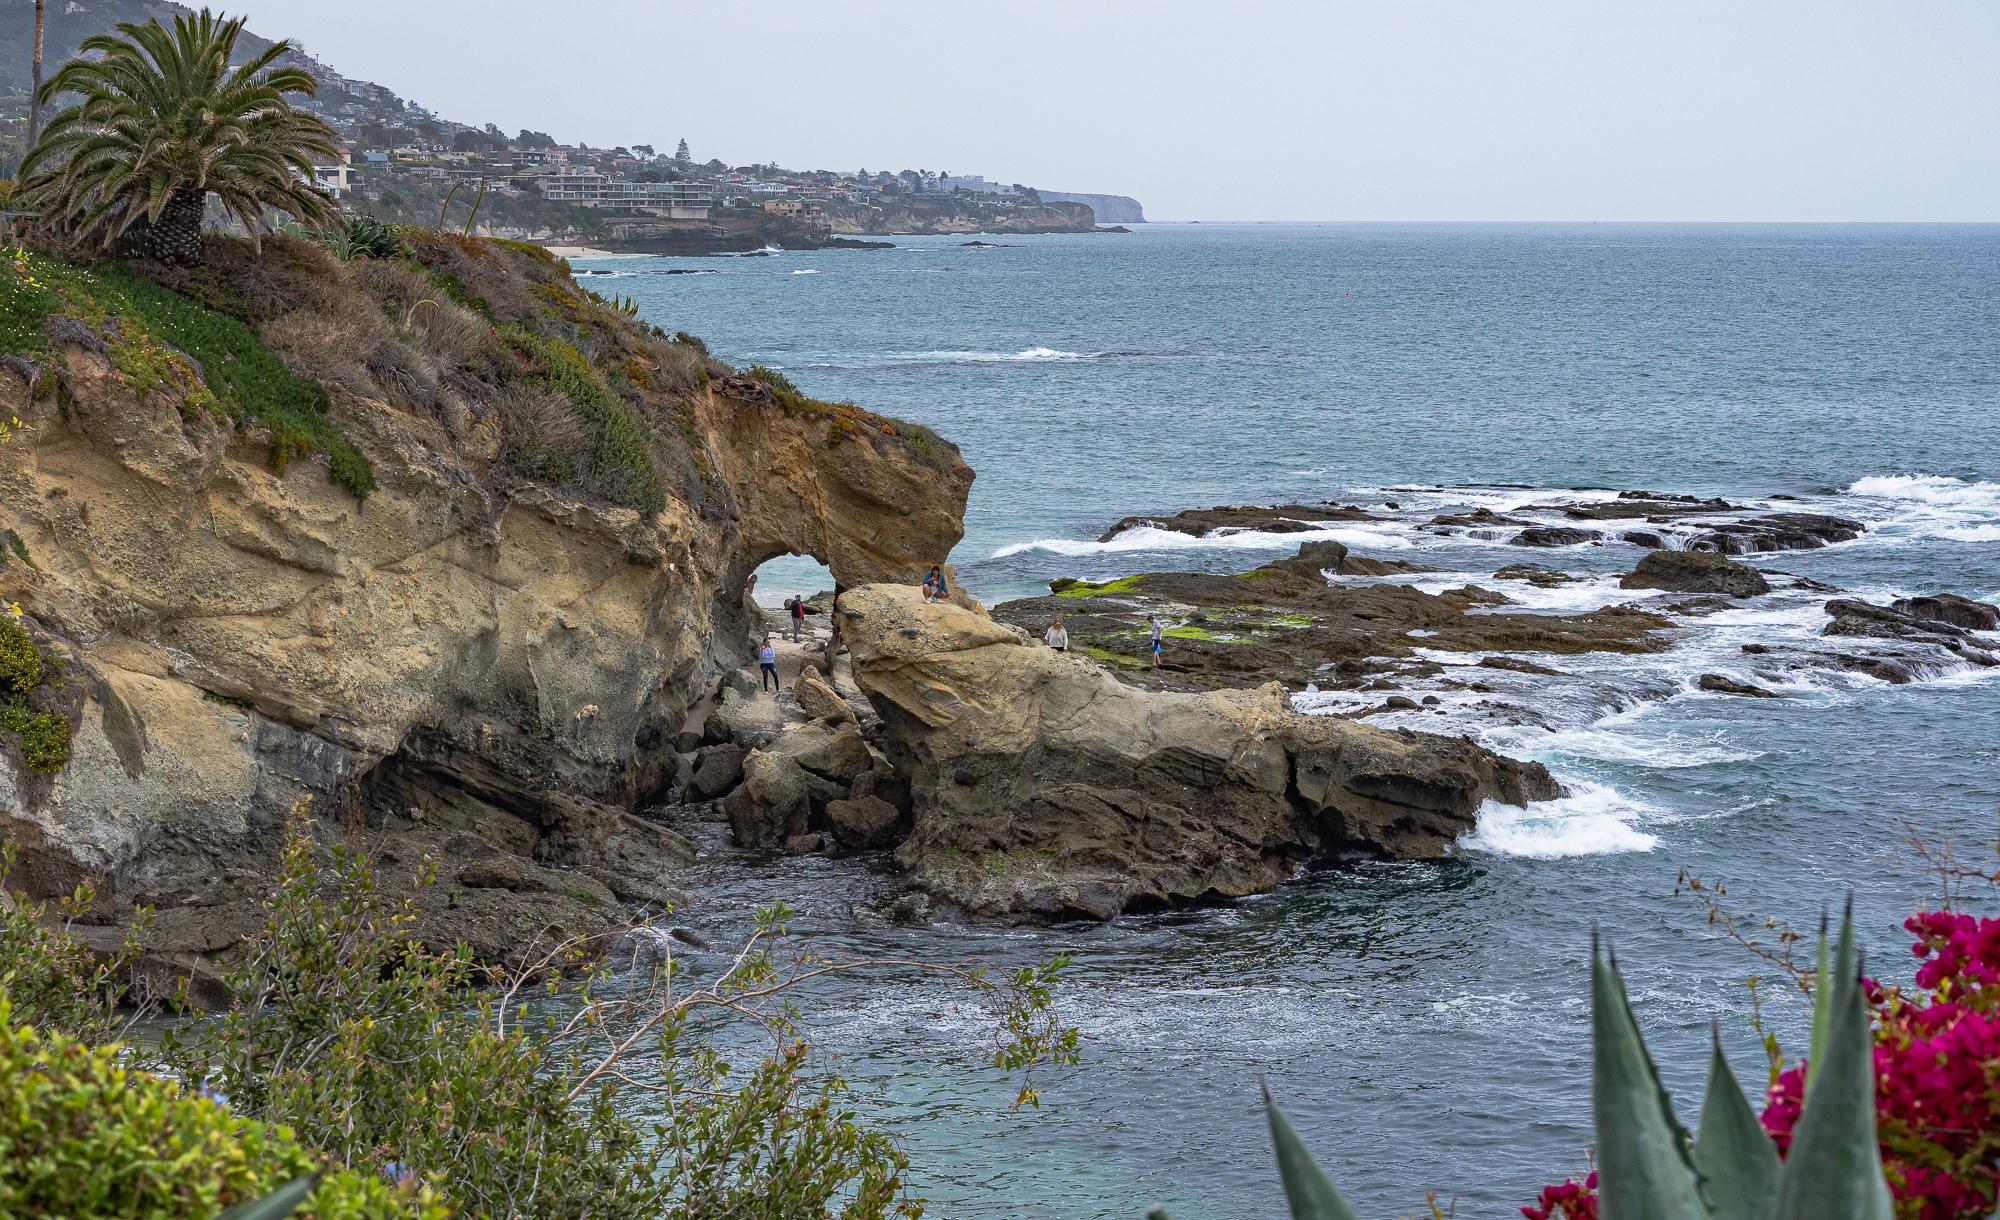 Laguna Beach Coastline from Montage Hotel Grounds